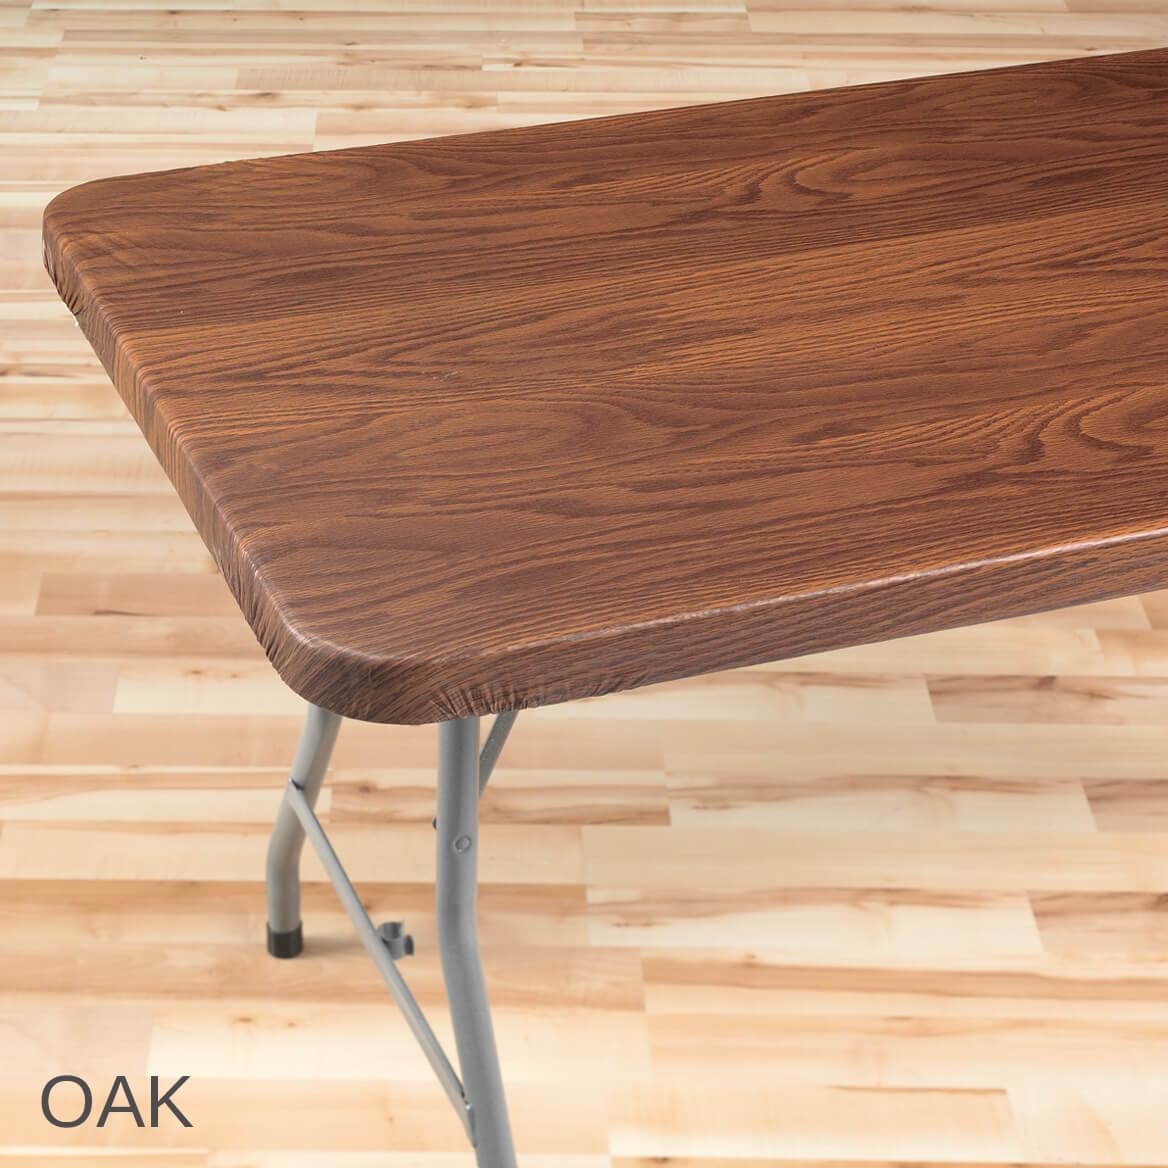 Wood Grain Vinyl Elasticized Banquet Table Cover-344629